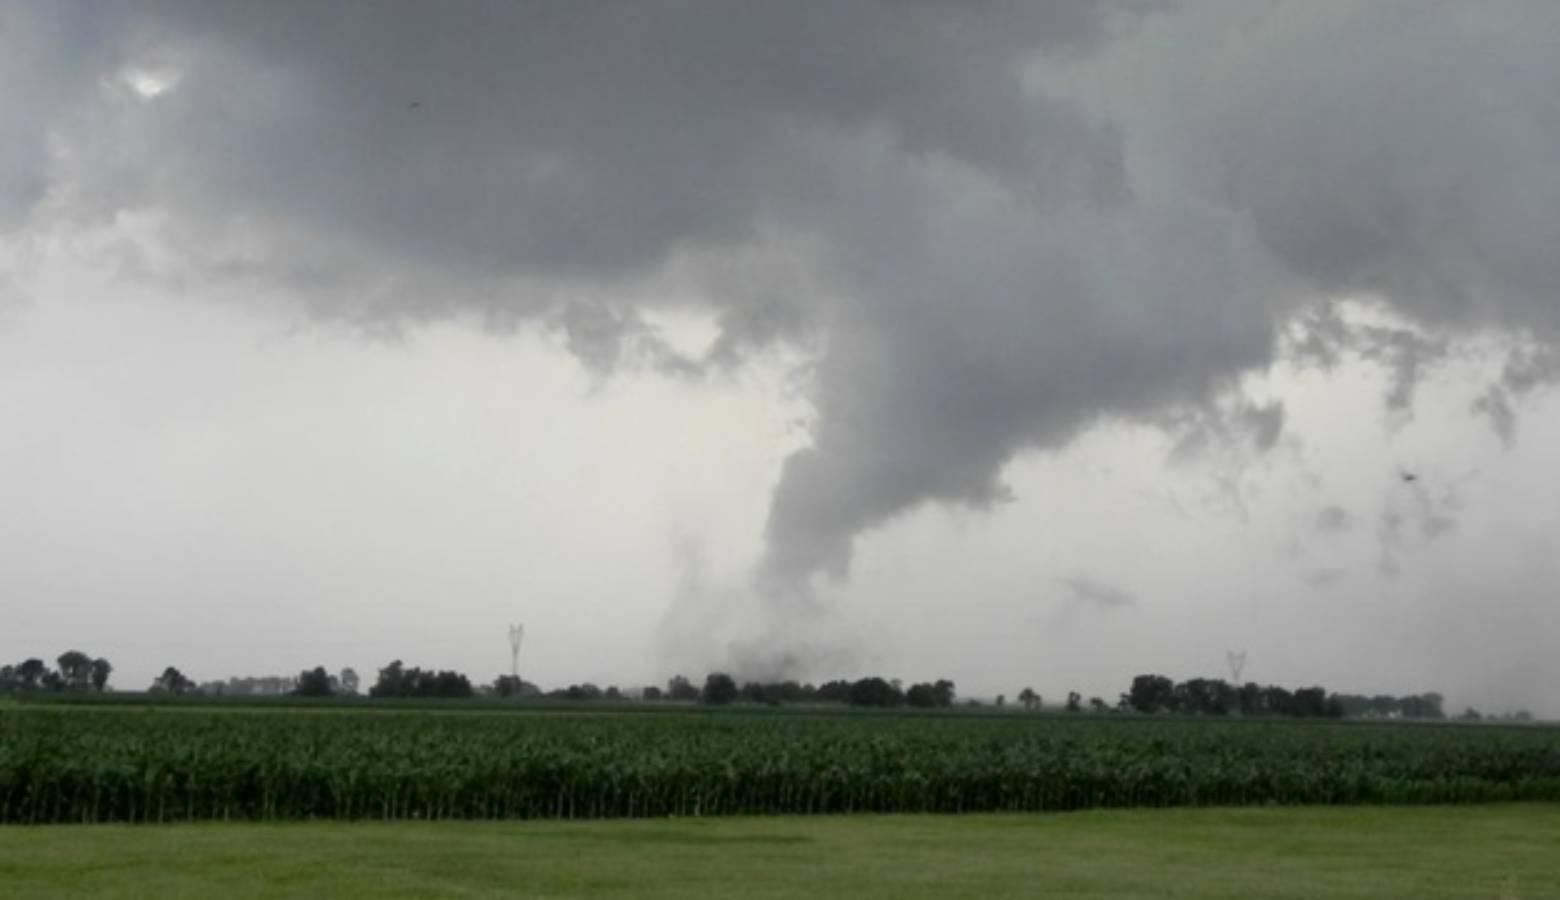 Indiana white county idaville - Ray Allie Photo Via White County Ema